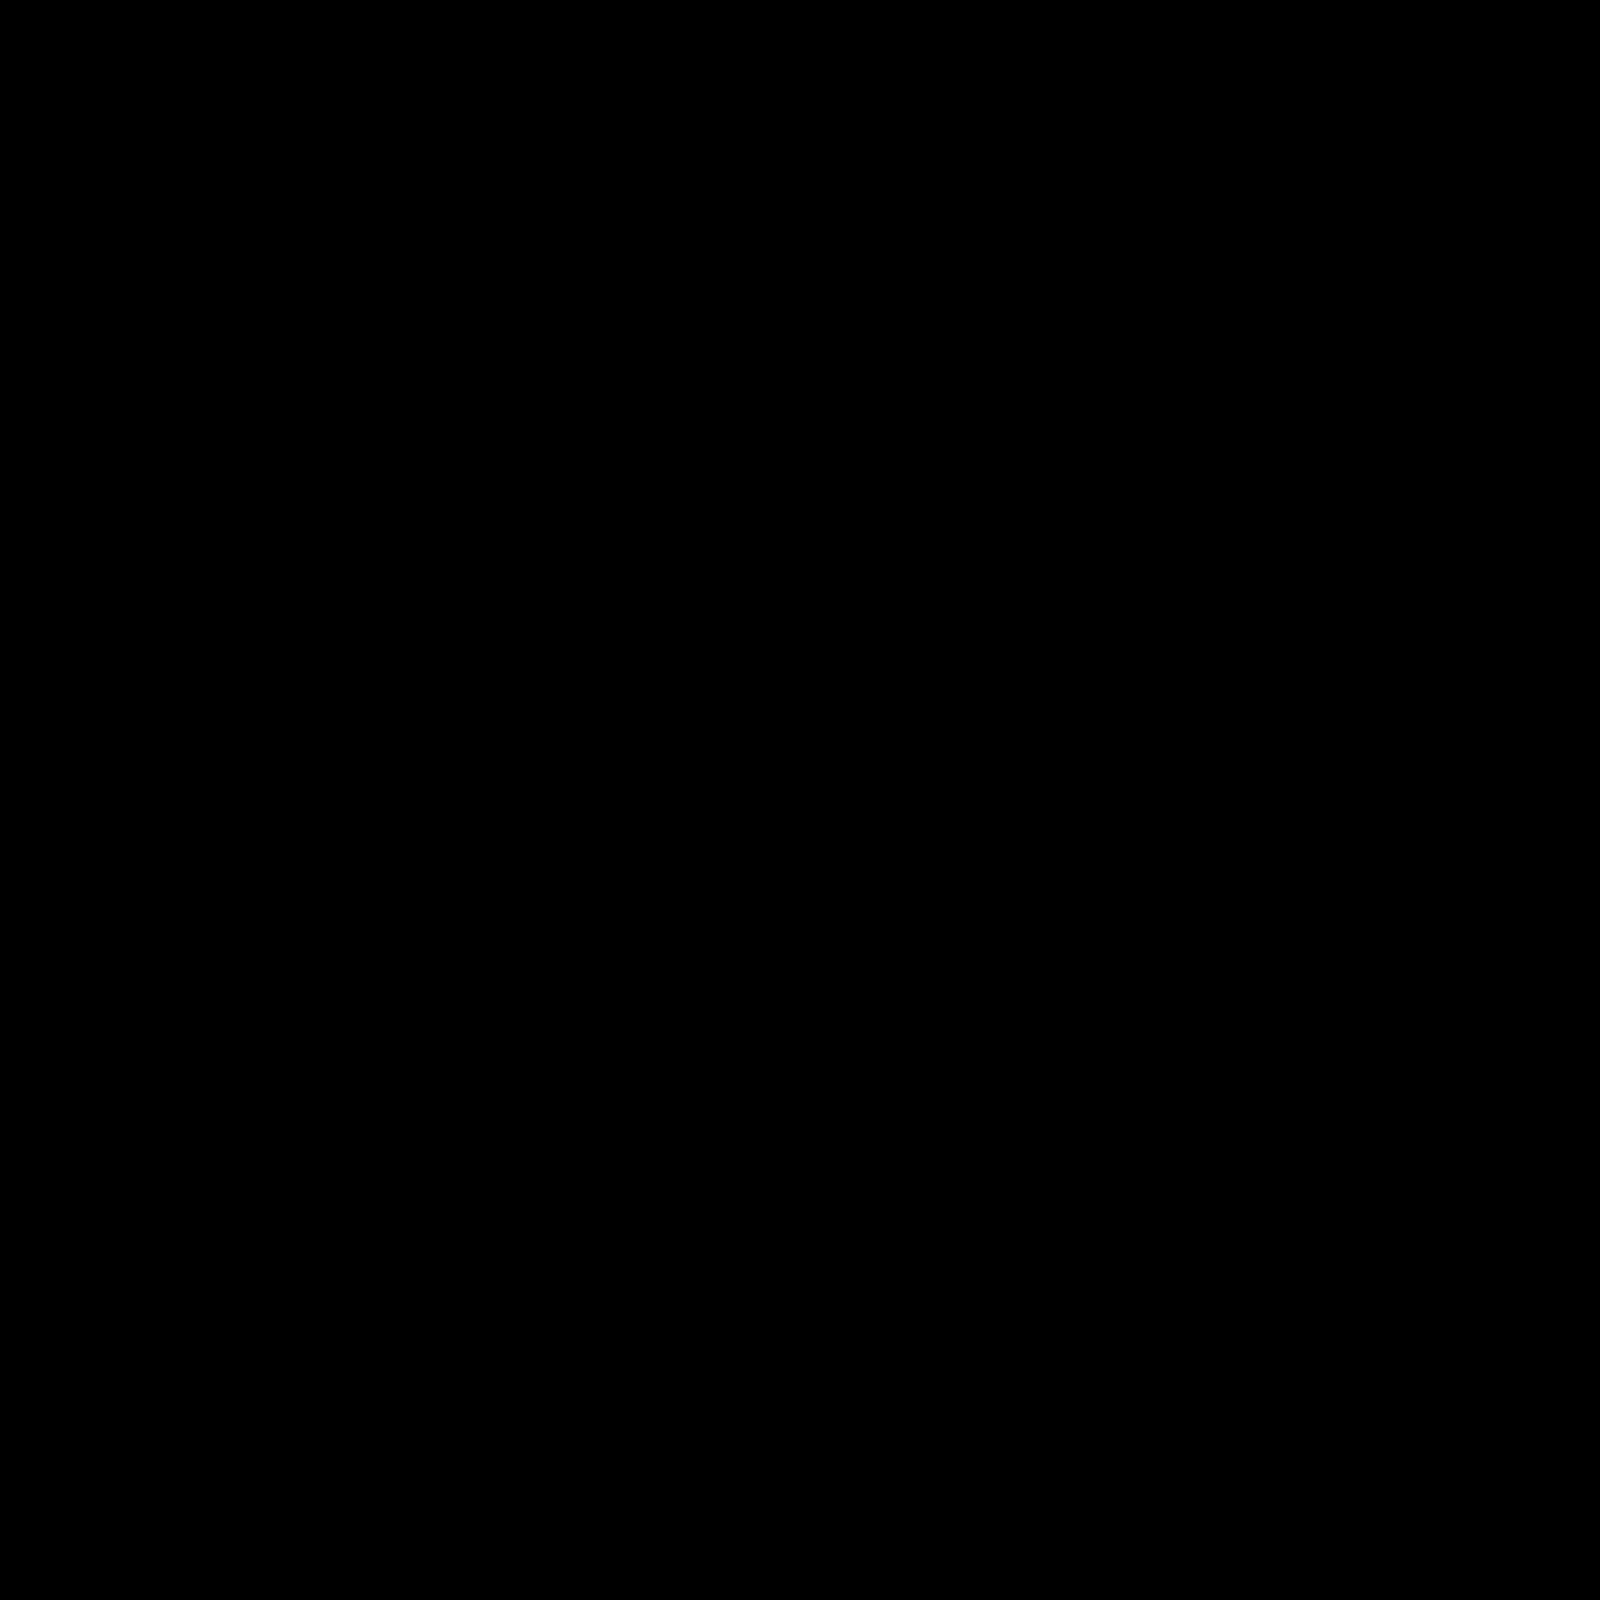 Dokument email icon